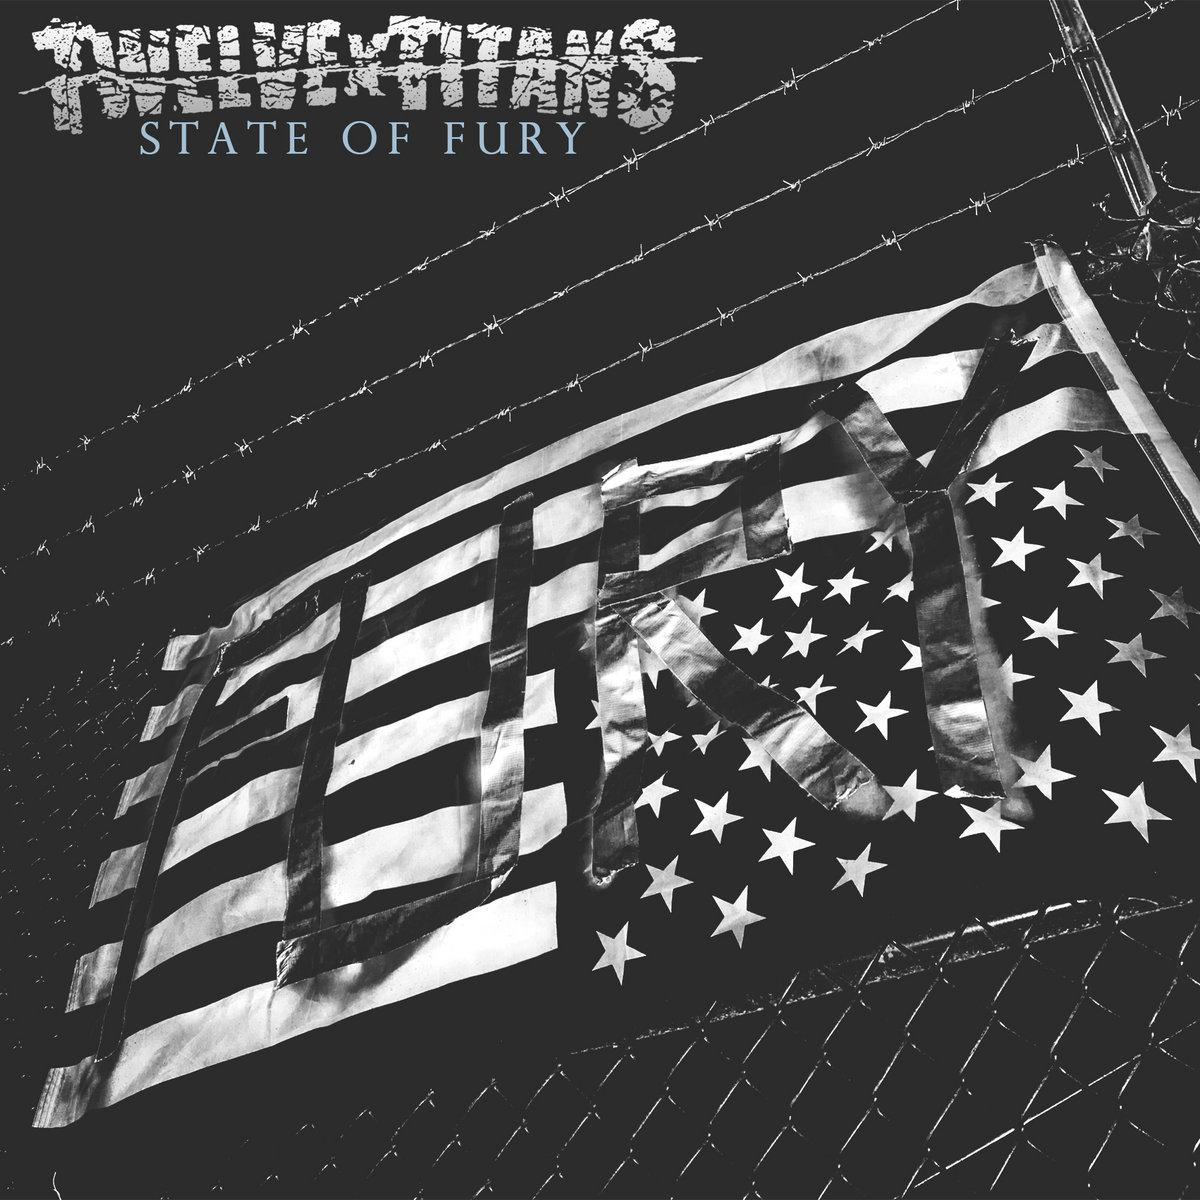 TwelvexTitans - State of Fury [EP] (2017)